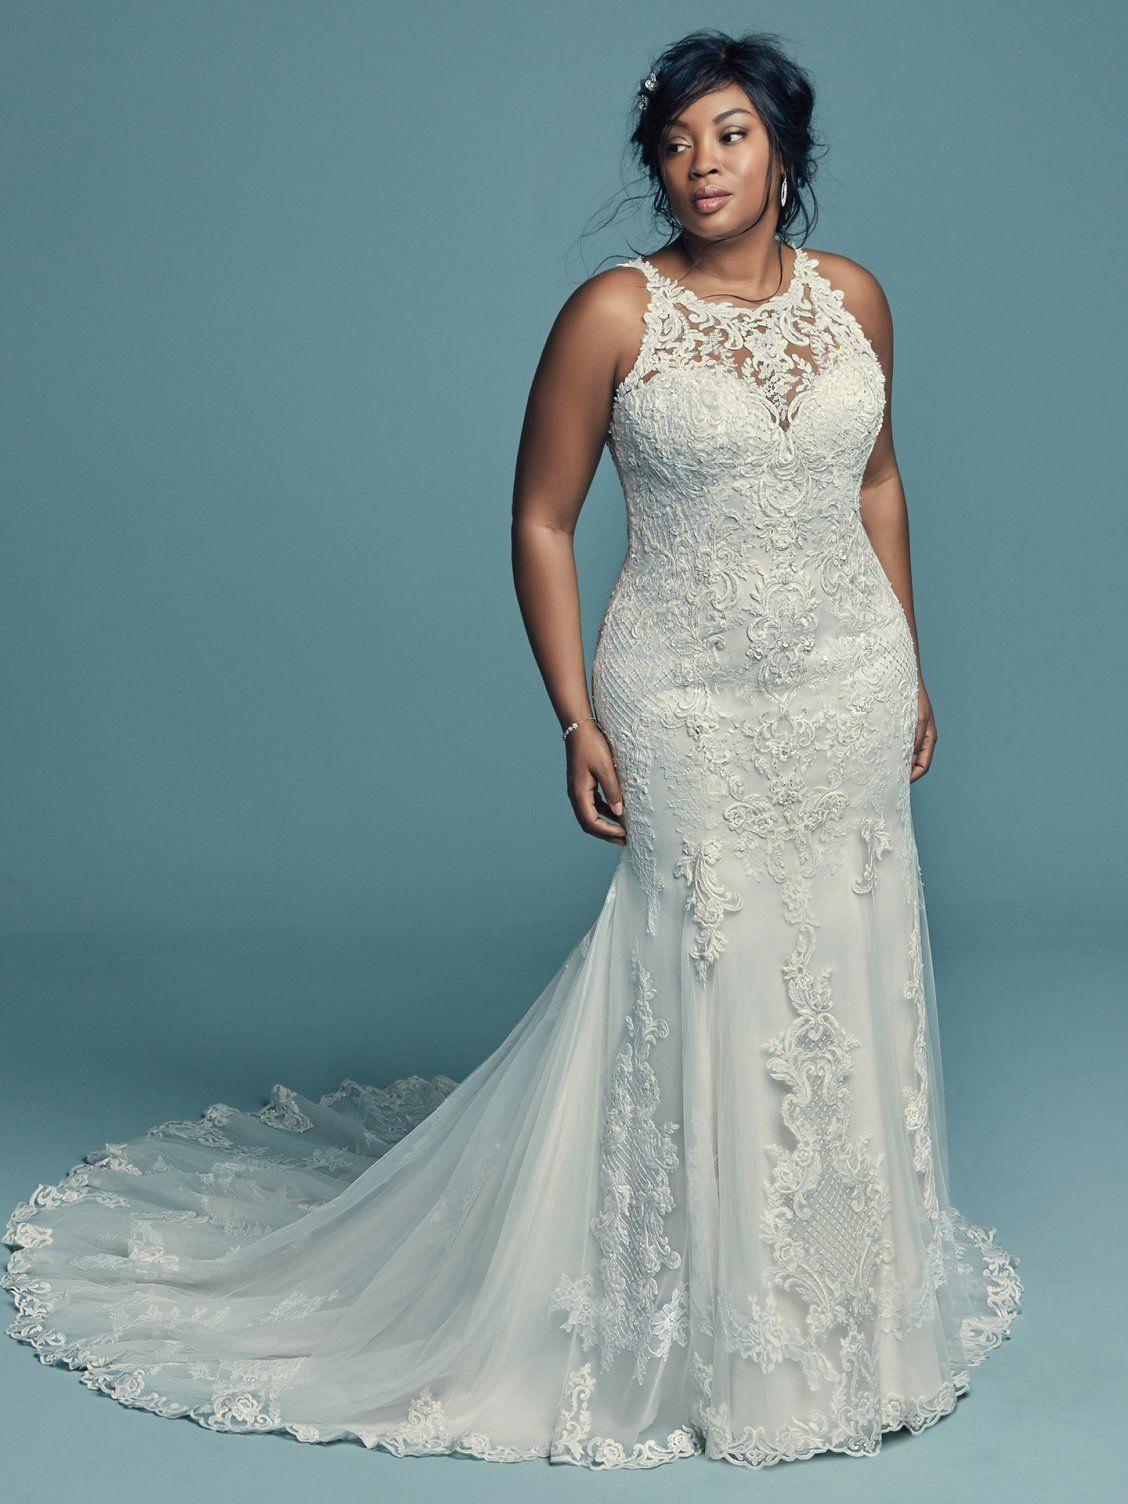 22 Mermaid Wedding Dresses Plus Wedding Dresses Wedding Dresses Fitted Wedding Dress [ 1504 x 1128 Pixel ]